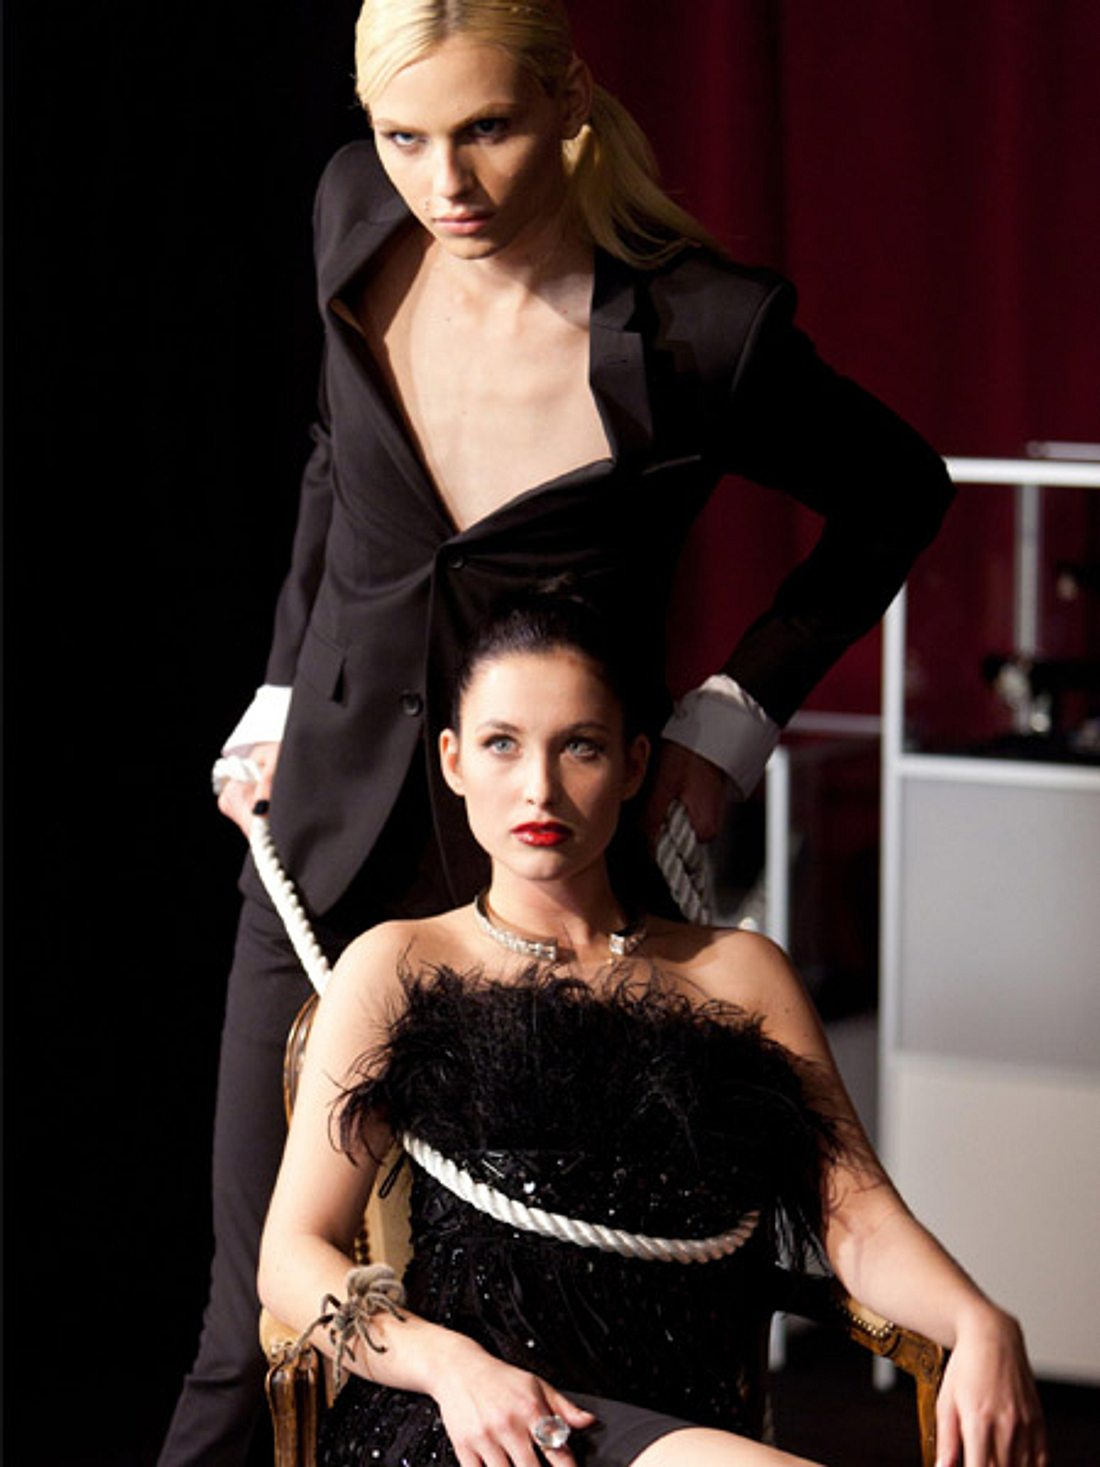 Supermodel Andrej Pejic und Paula-Helen Mannhardt (21) beim Shooting.